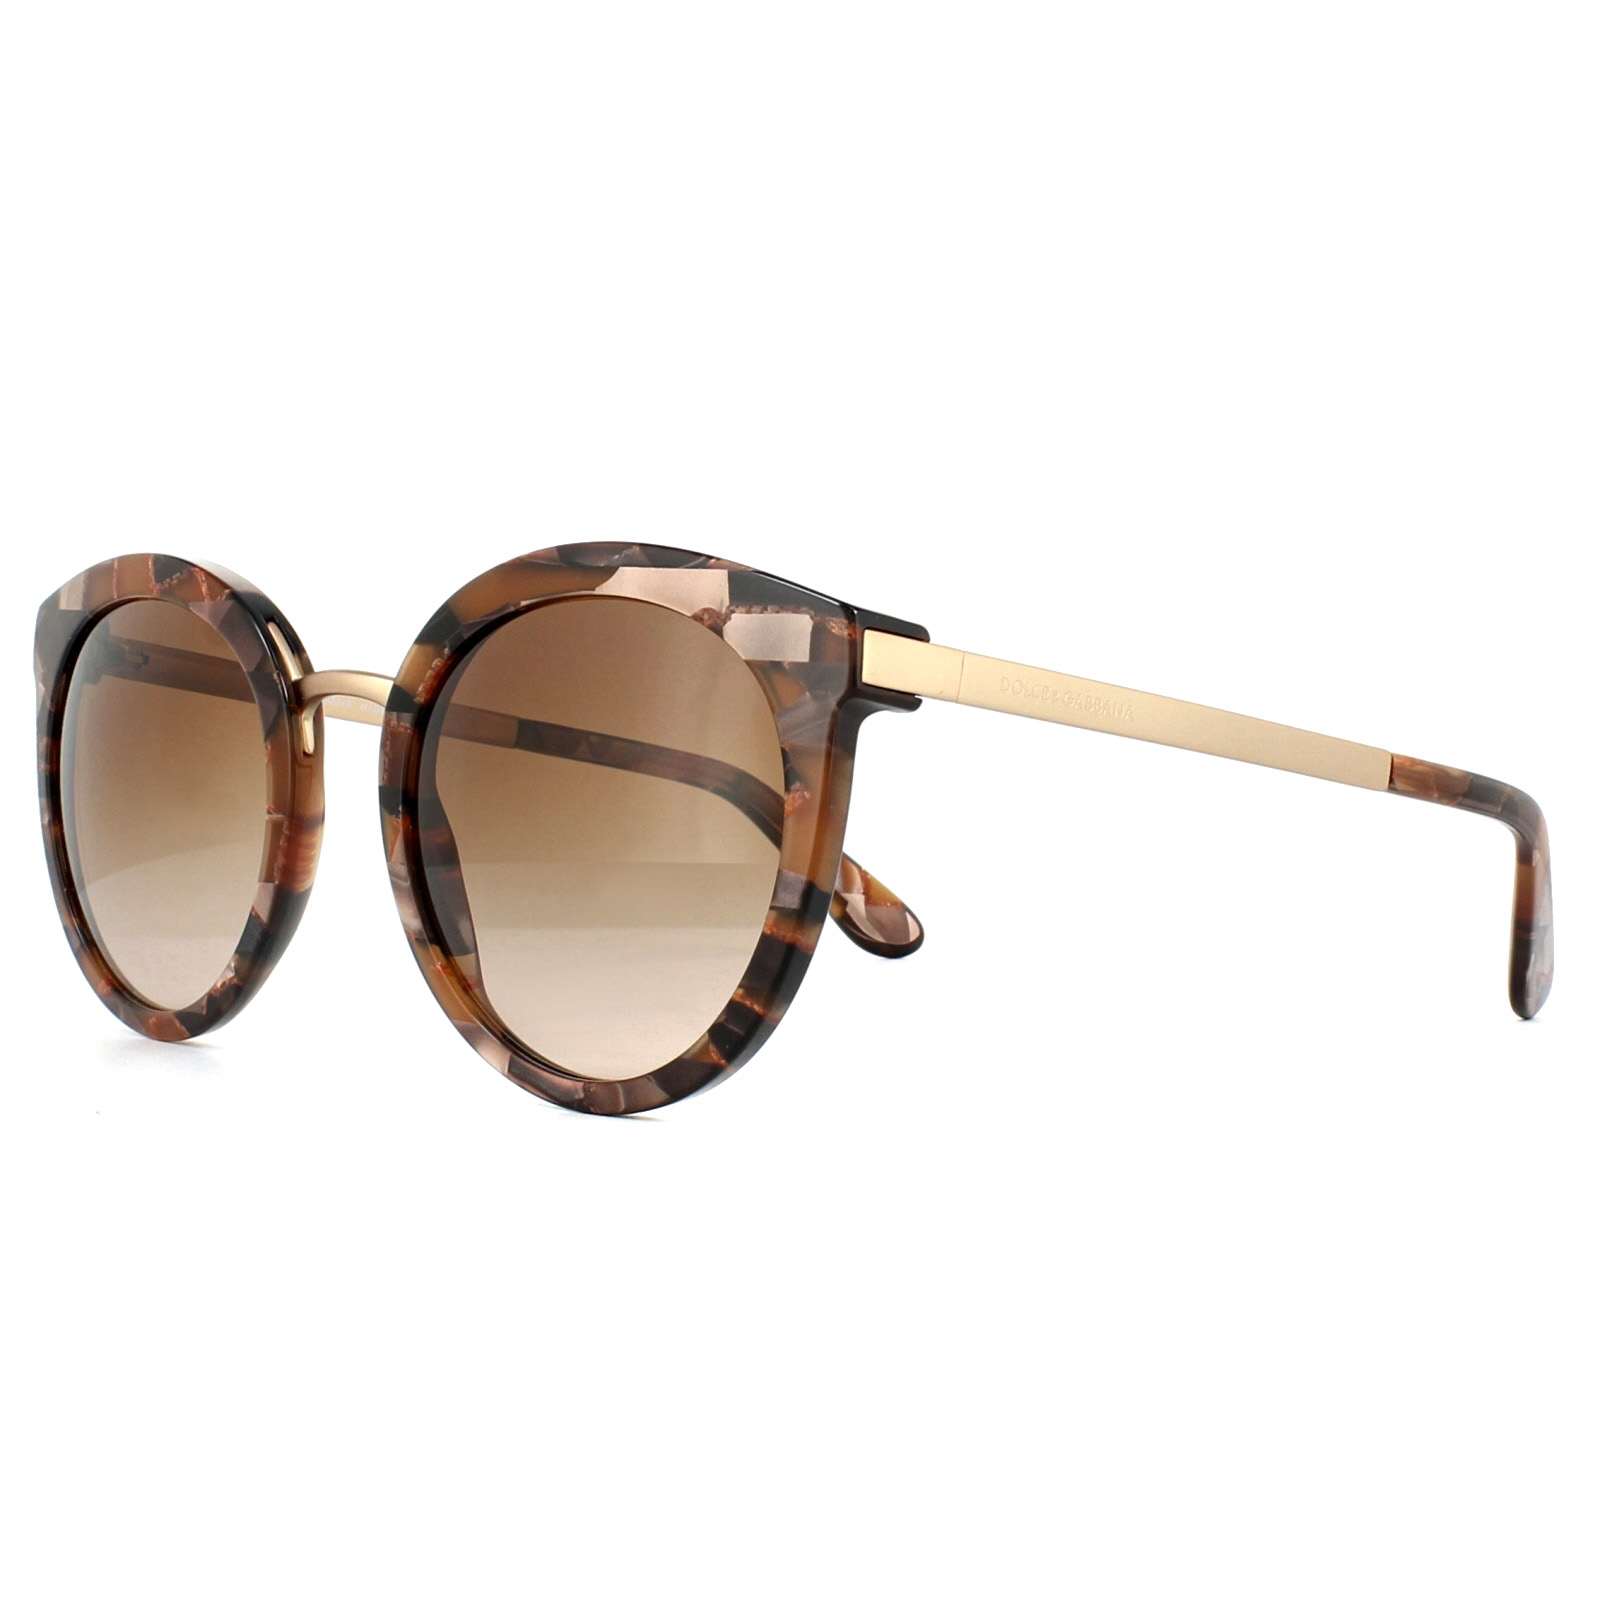 Cube Bronze Gabbana Dolce Gradient amp; Sunglasses 313113 eBay 4268 Brown RxOFTX